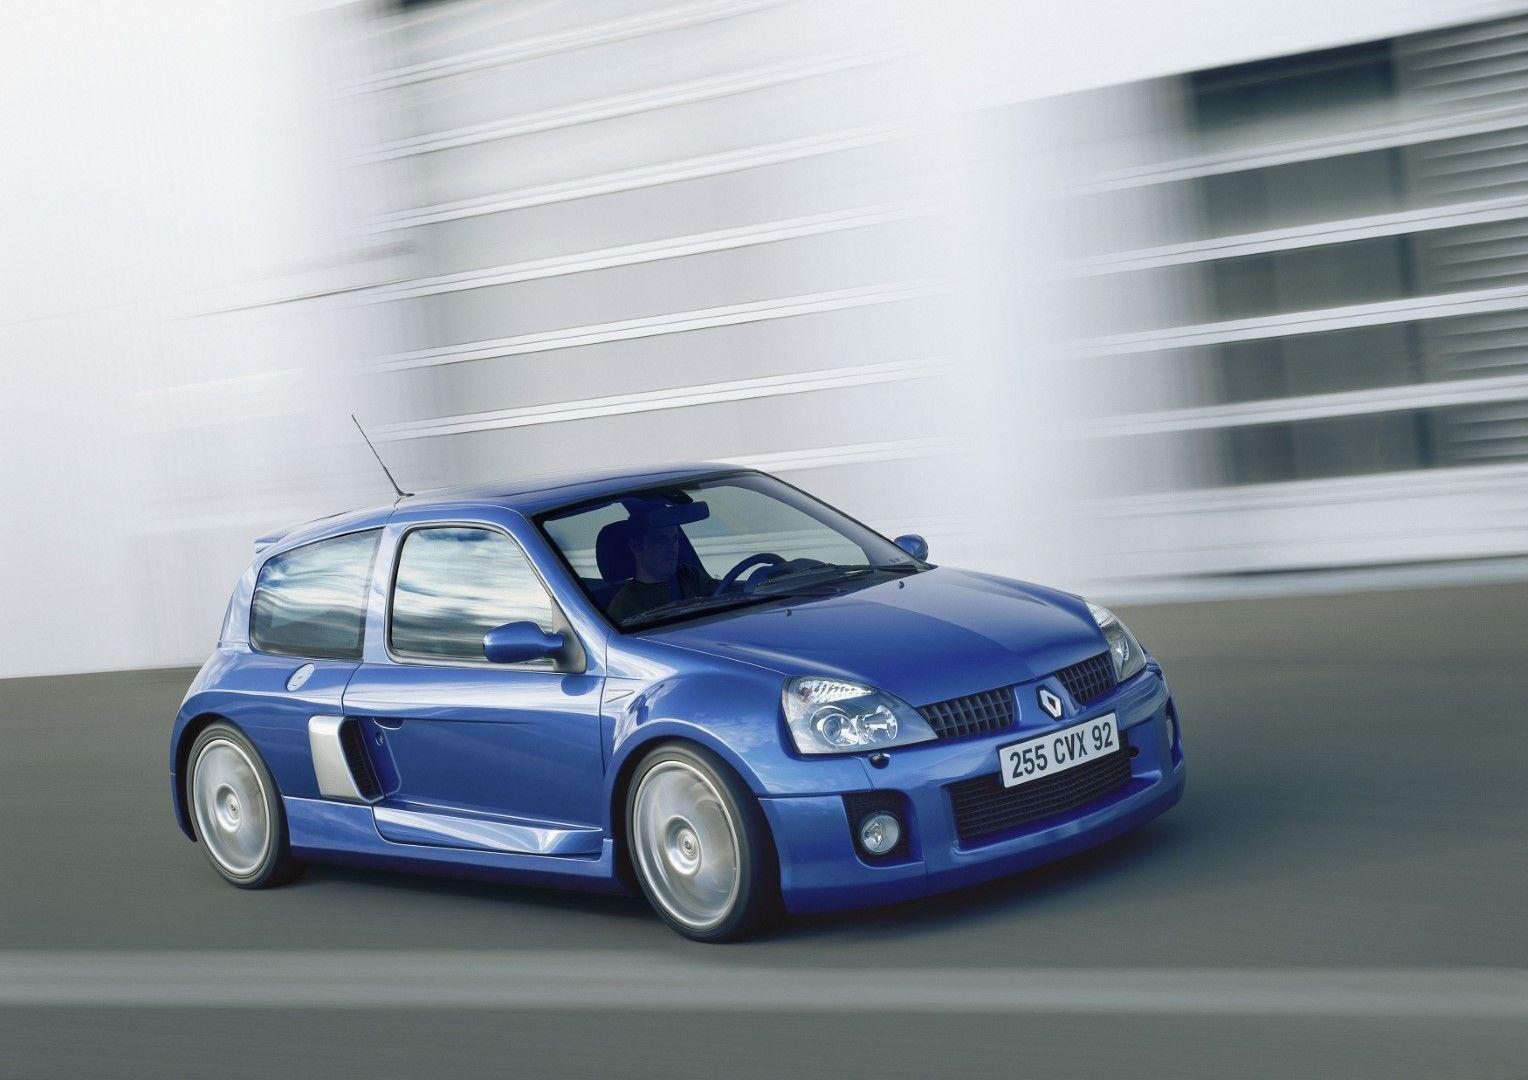 2002 Renault Clio 2 V6 3 0 60 V6 Es9 24v Engine 230 Ps Hp